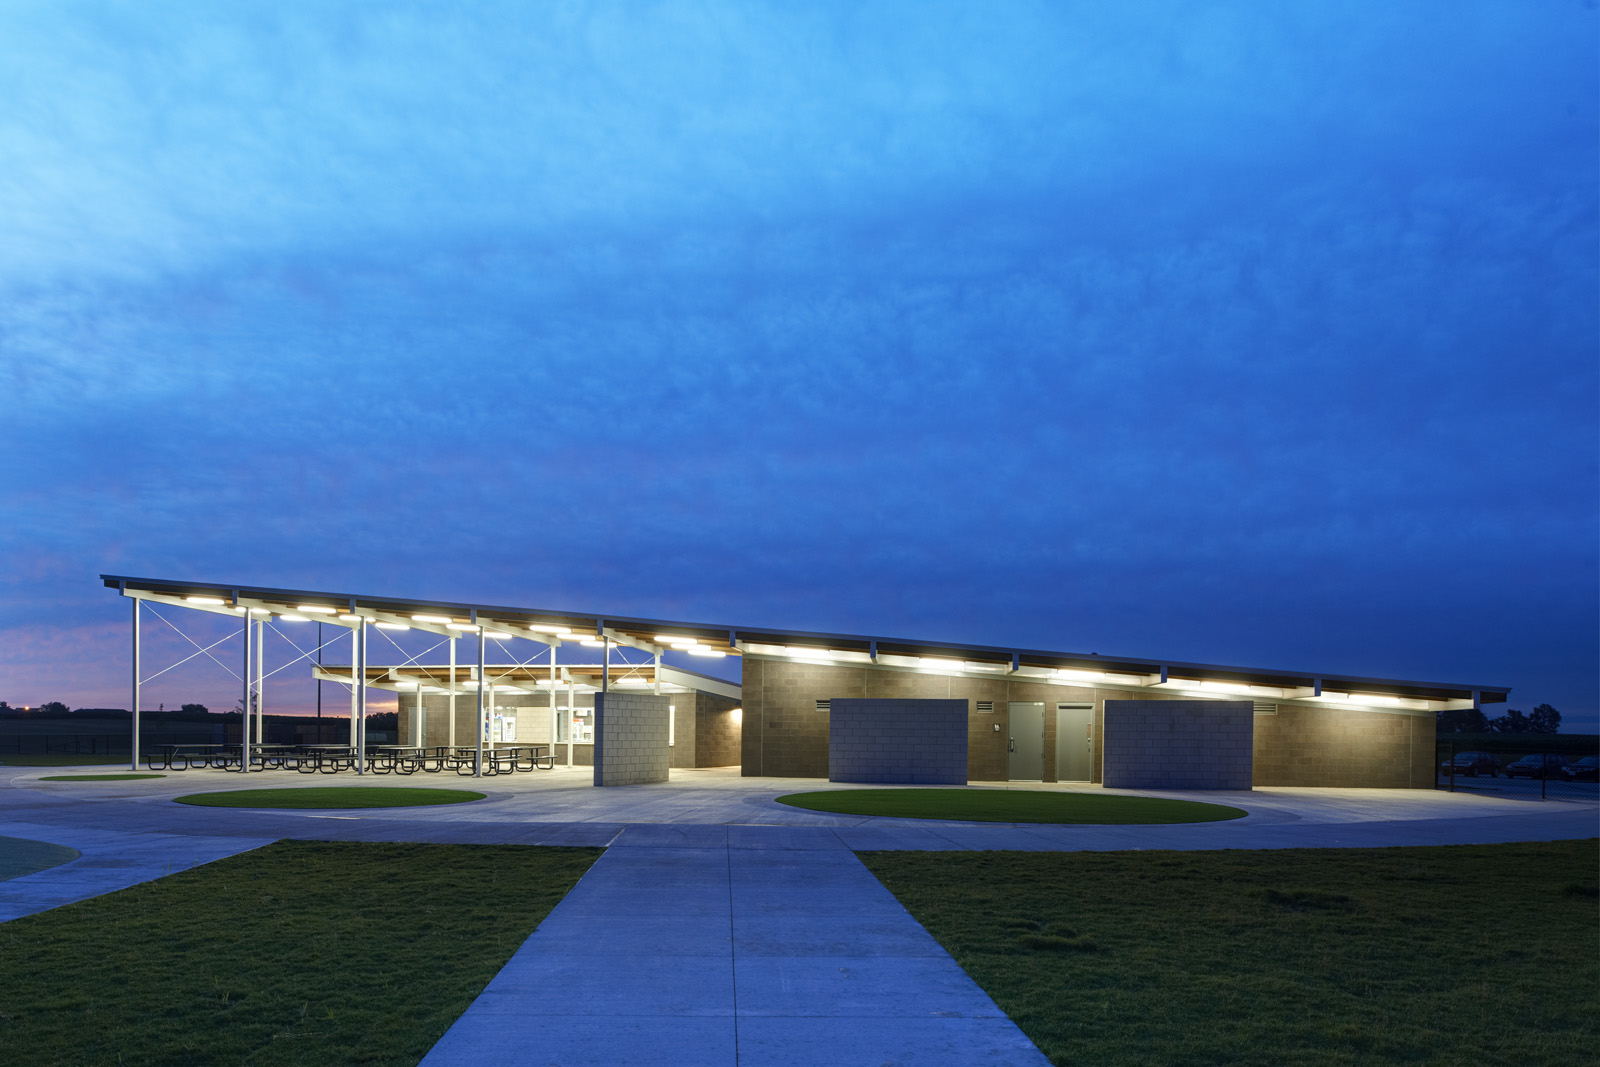 Altoona (IA) United States  City new picture : Complex | Architect Magazine | ASK Studio, Altoona, IA, United States ...